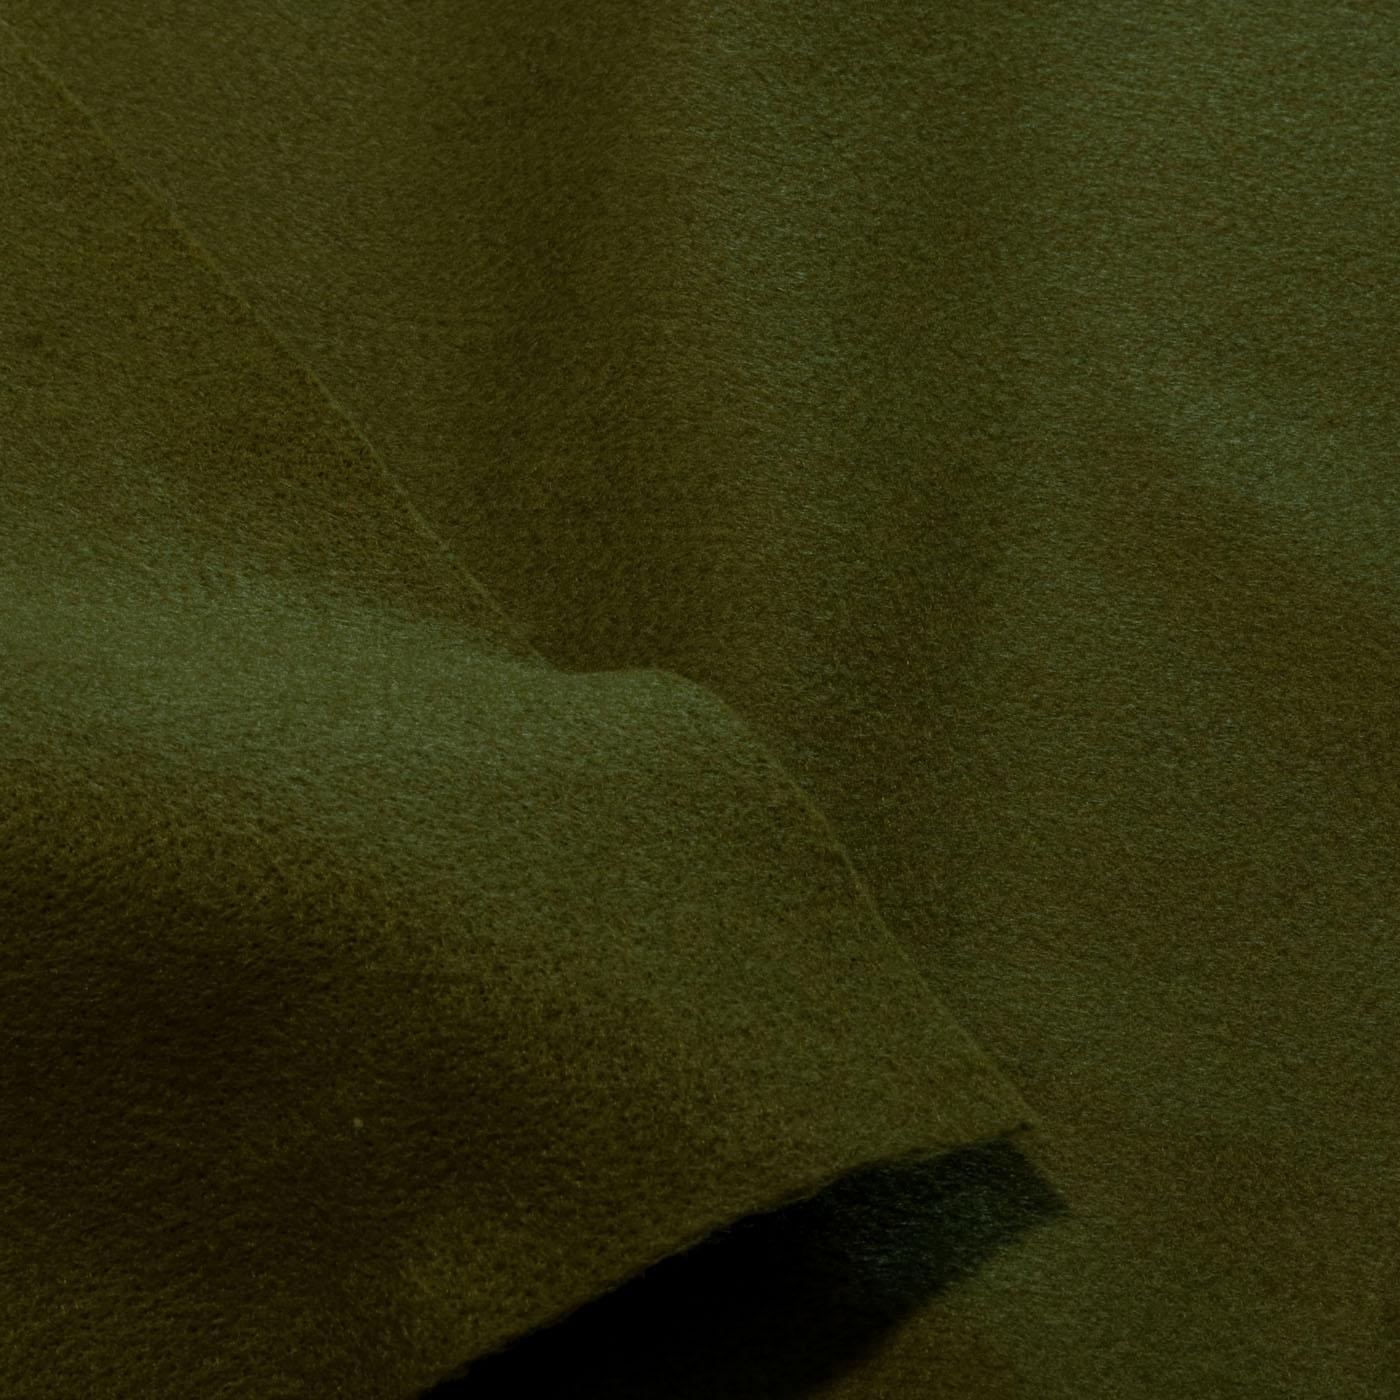 Tecido Feltro 100% Poliester 1,20 Mt Largura Verde Musgo